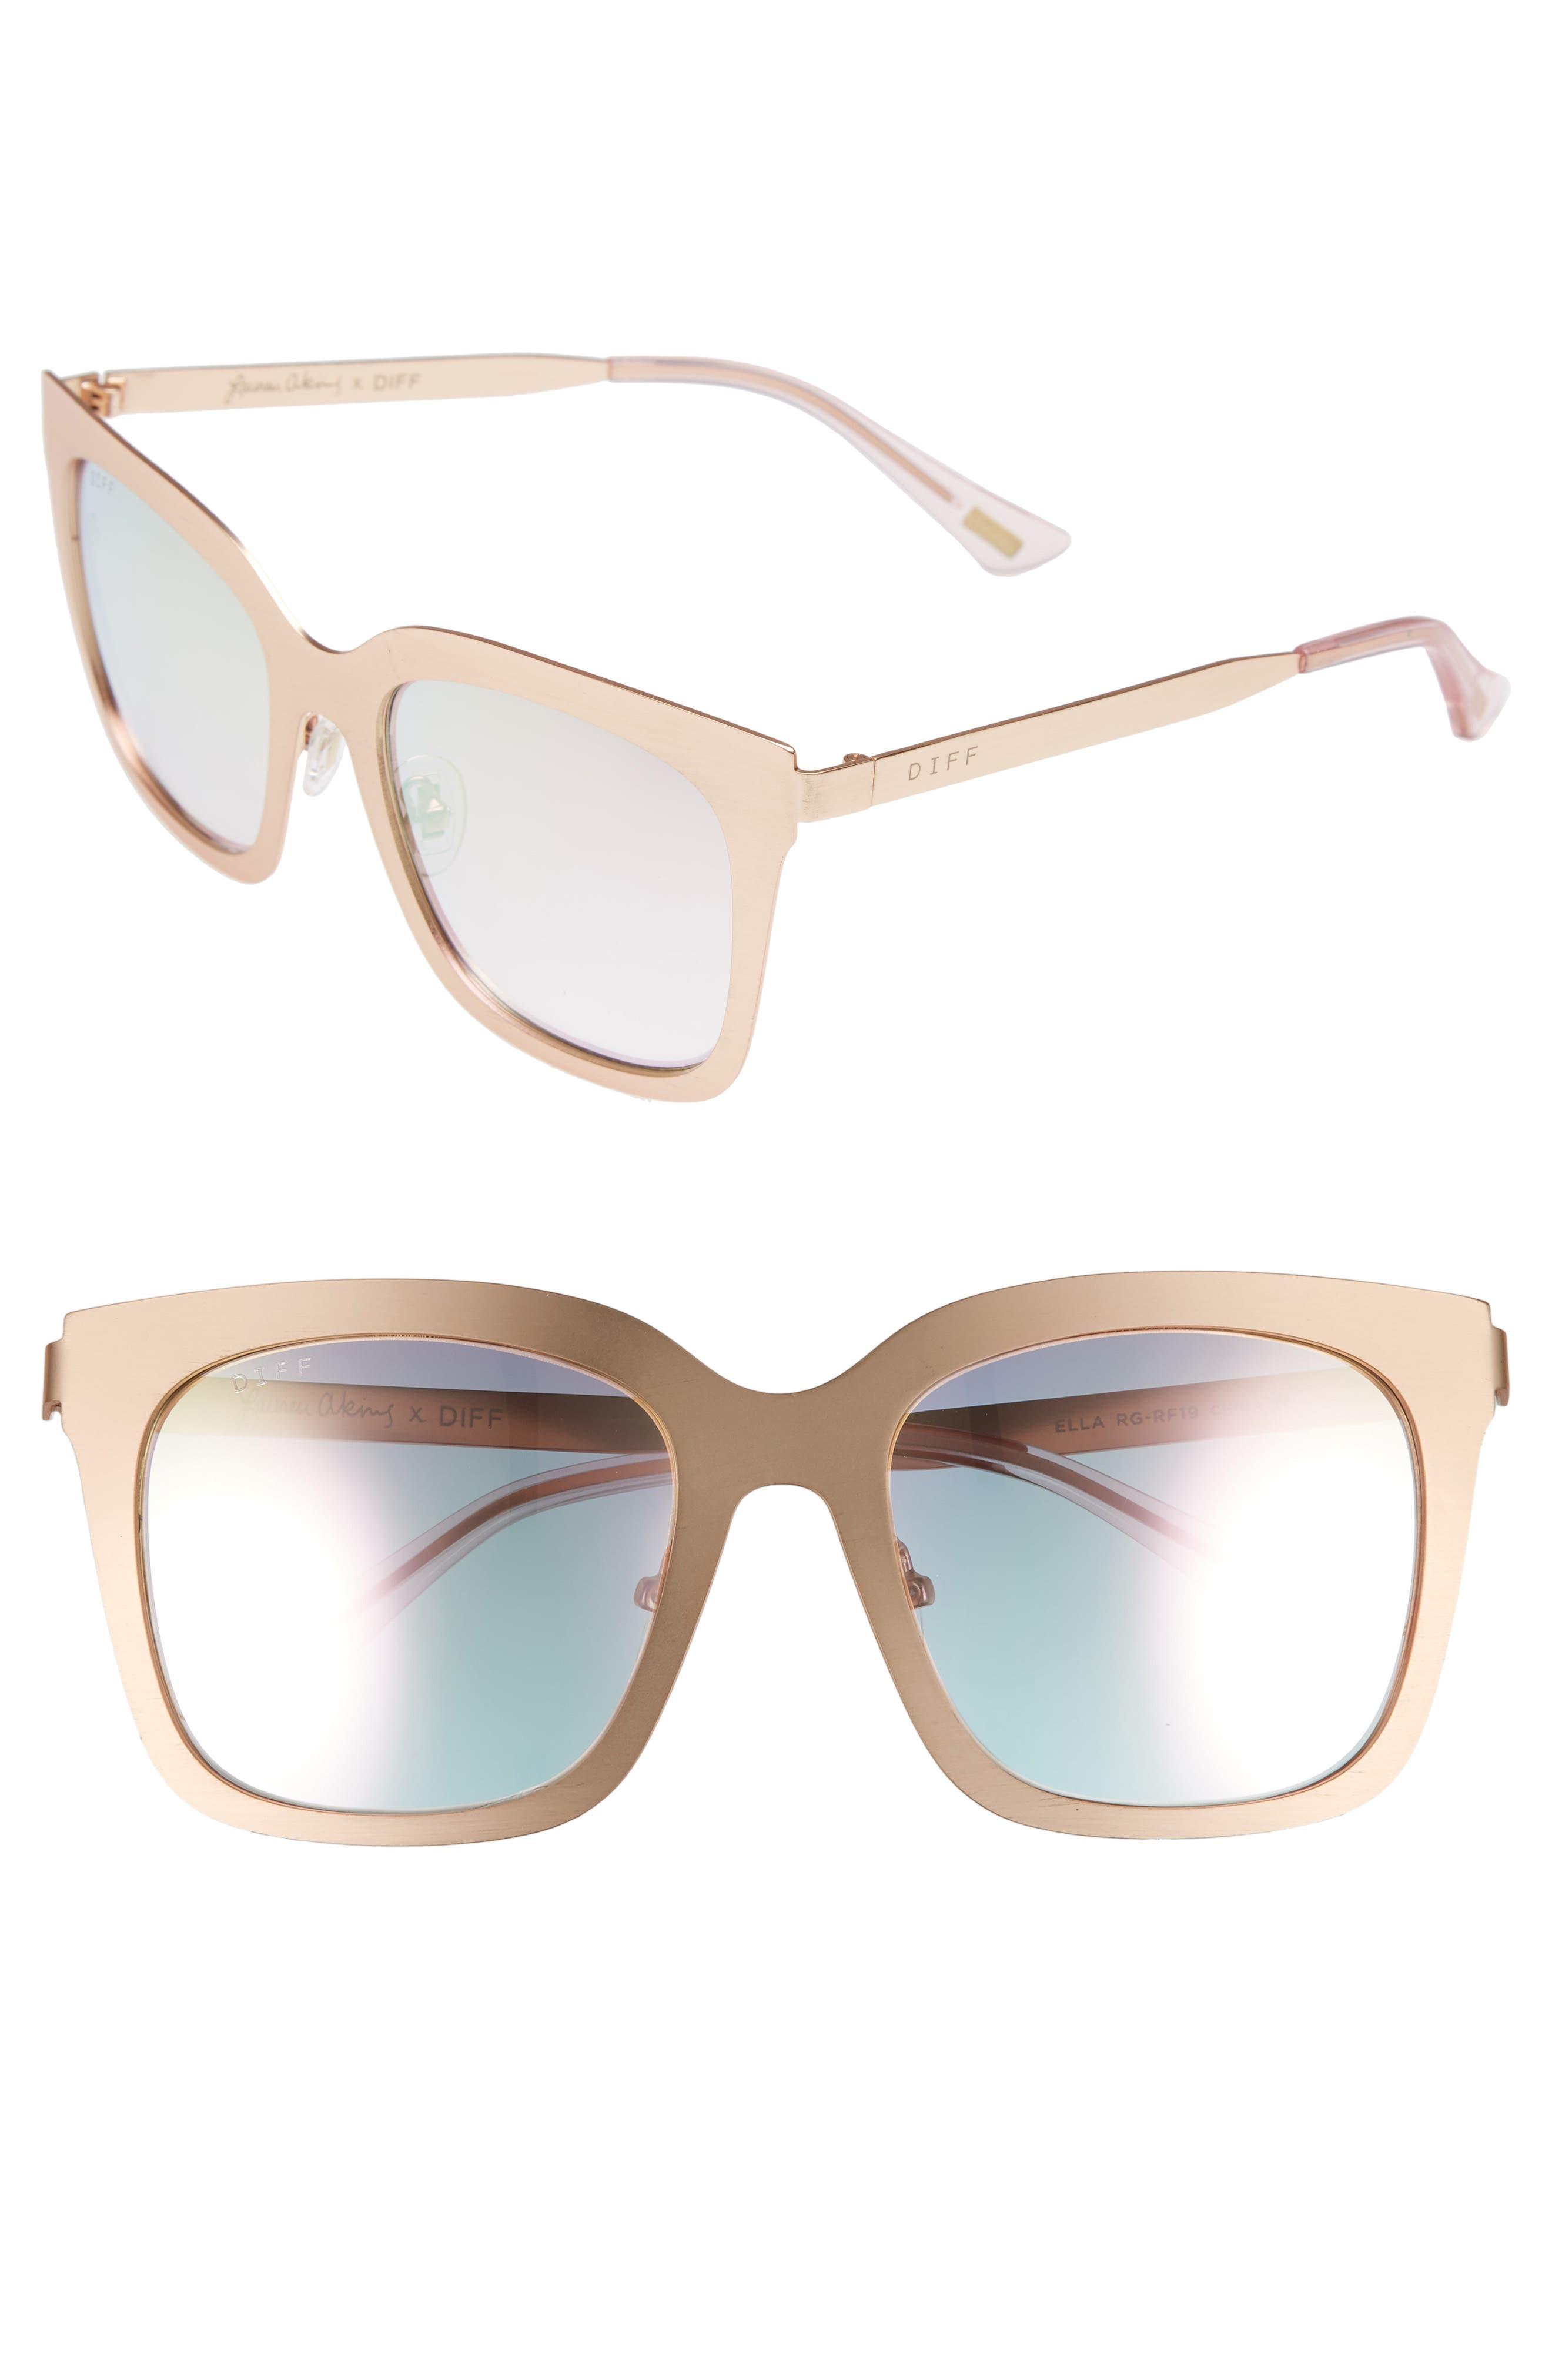 DIFF x Lauren Akins Ella 53mm Cat Eye Sunglasses